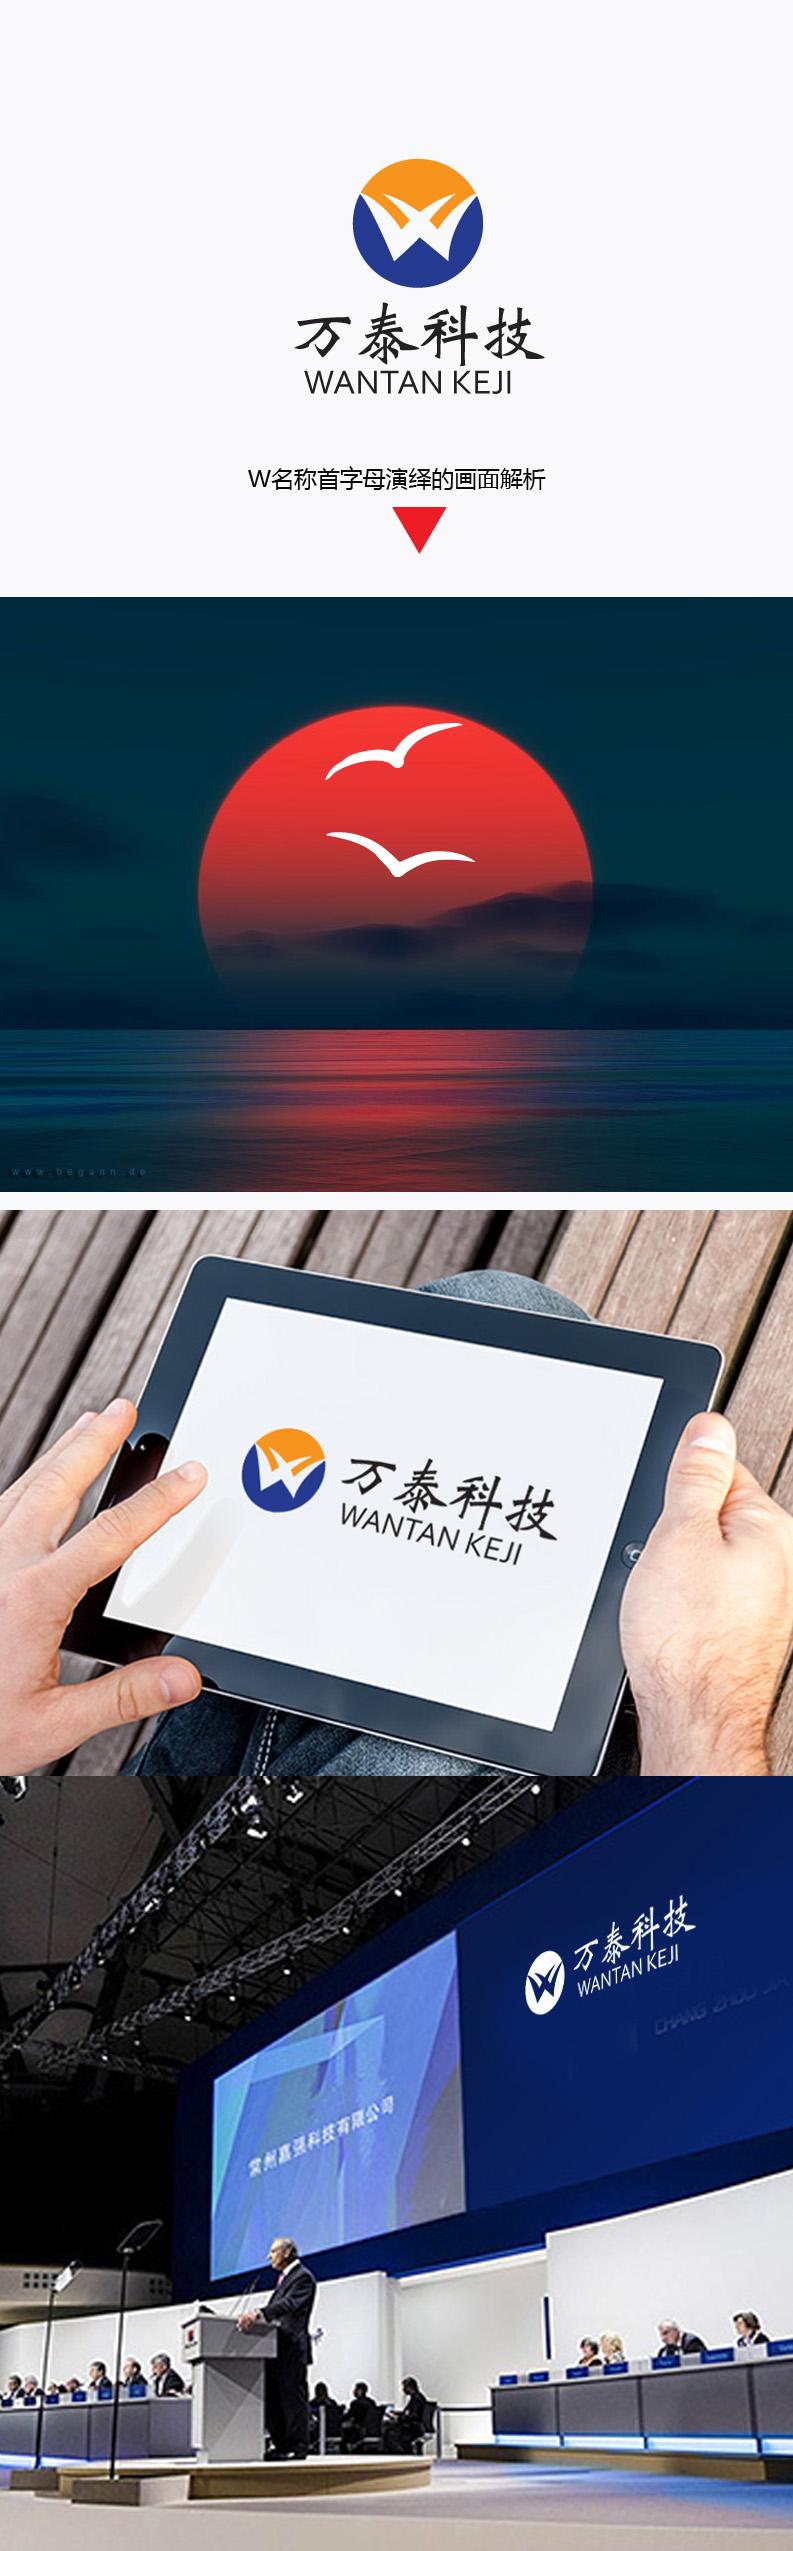 logo和名片设计_2952543_k68威客网